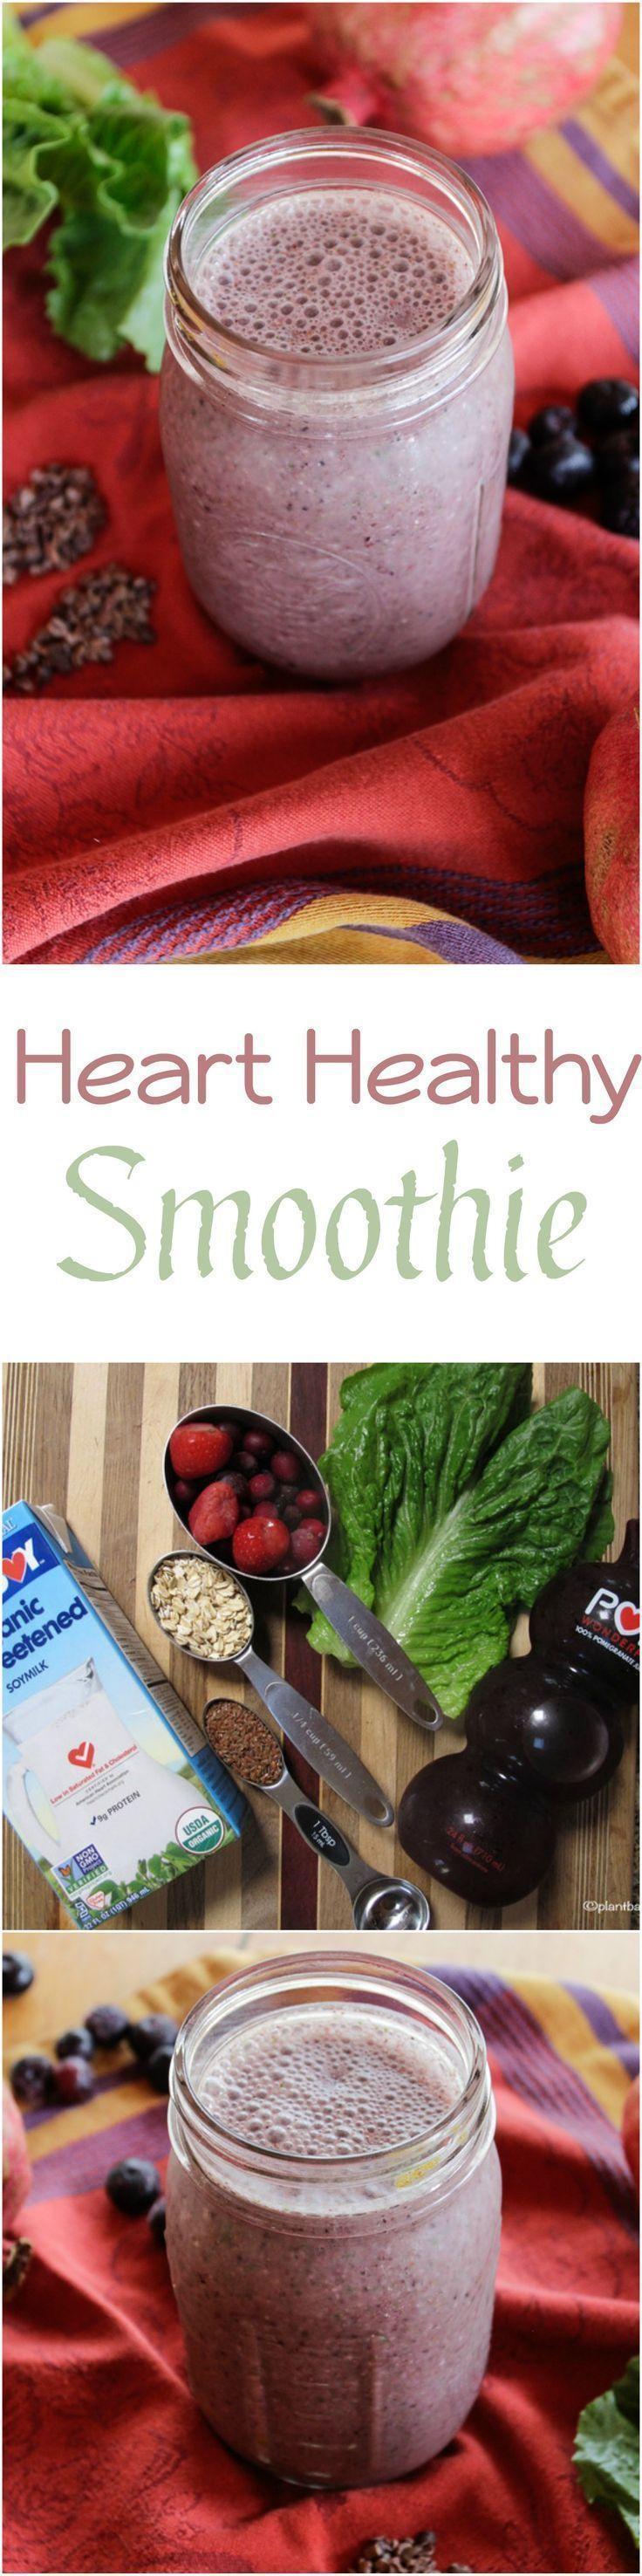 Wedding - Heart Healthy Smoothie